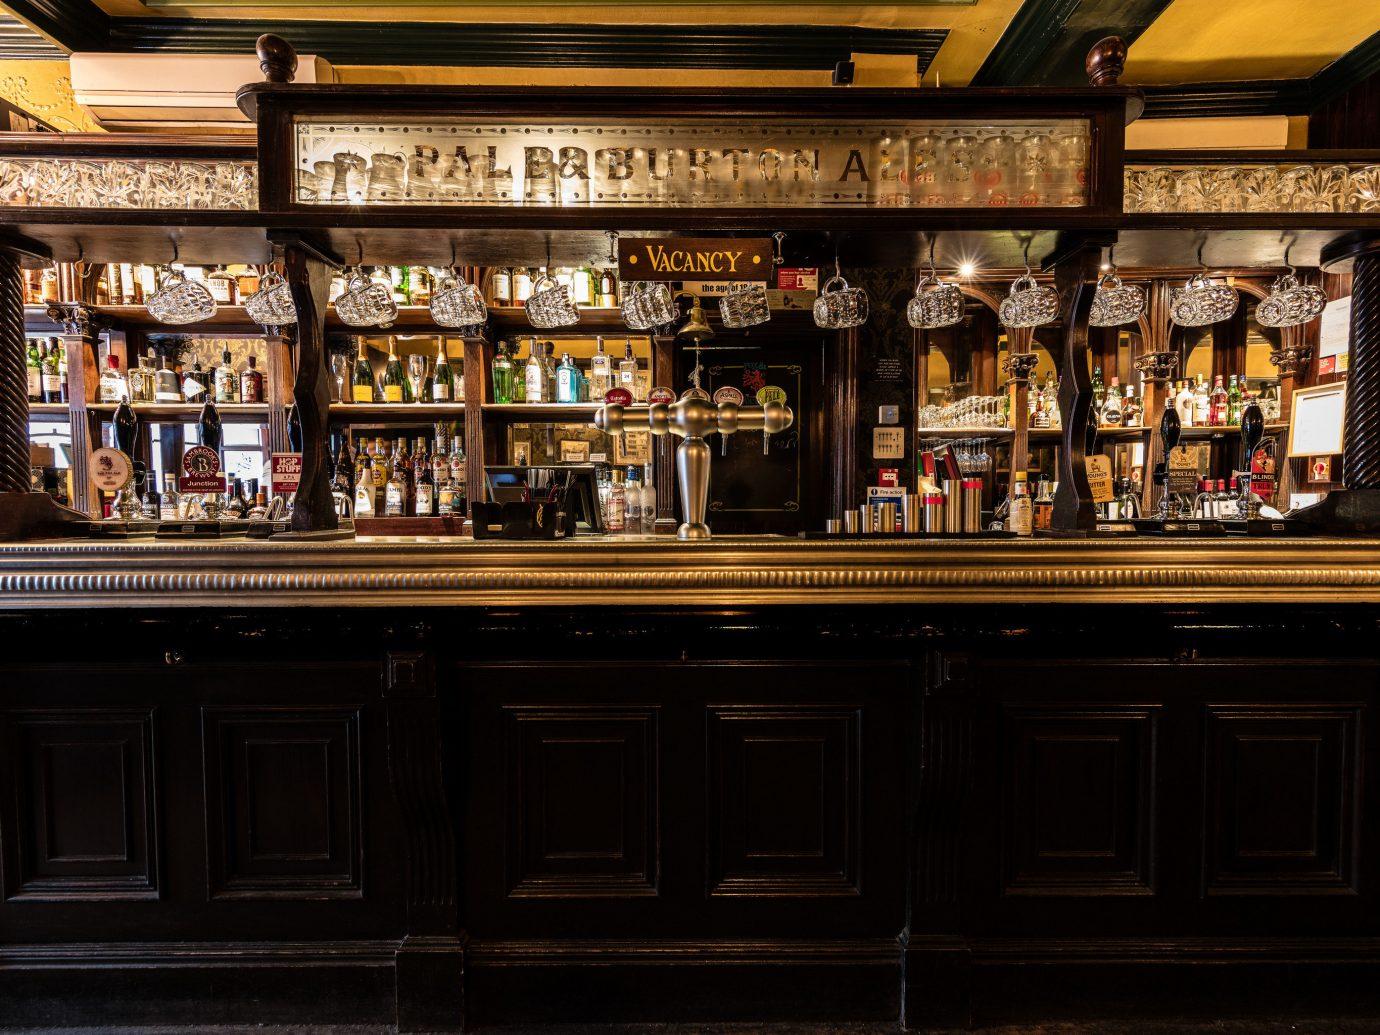 Budget Hotels London indoor shelf Bar building store liquor store several